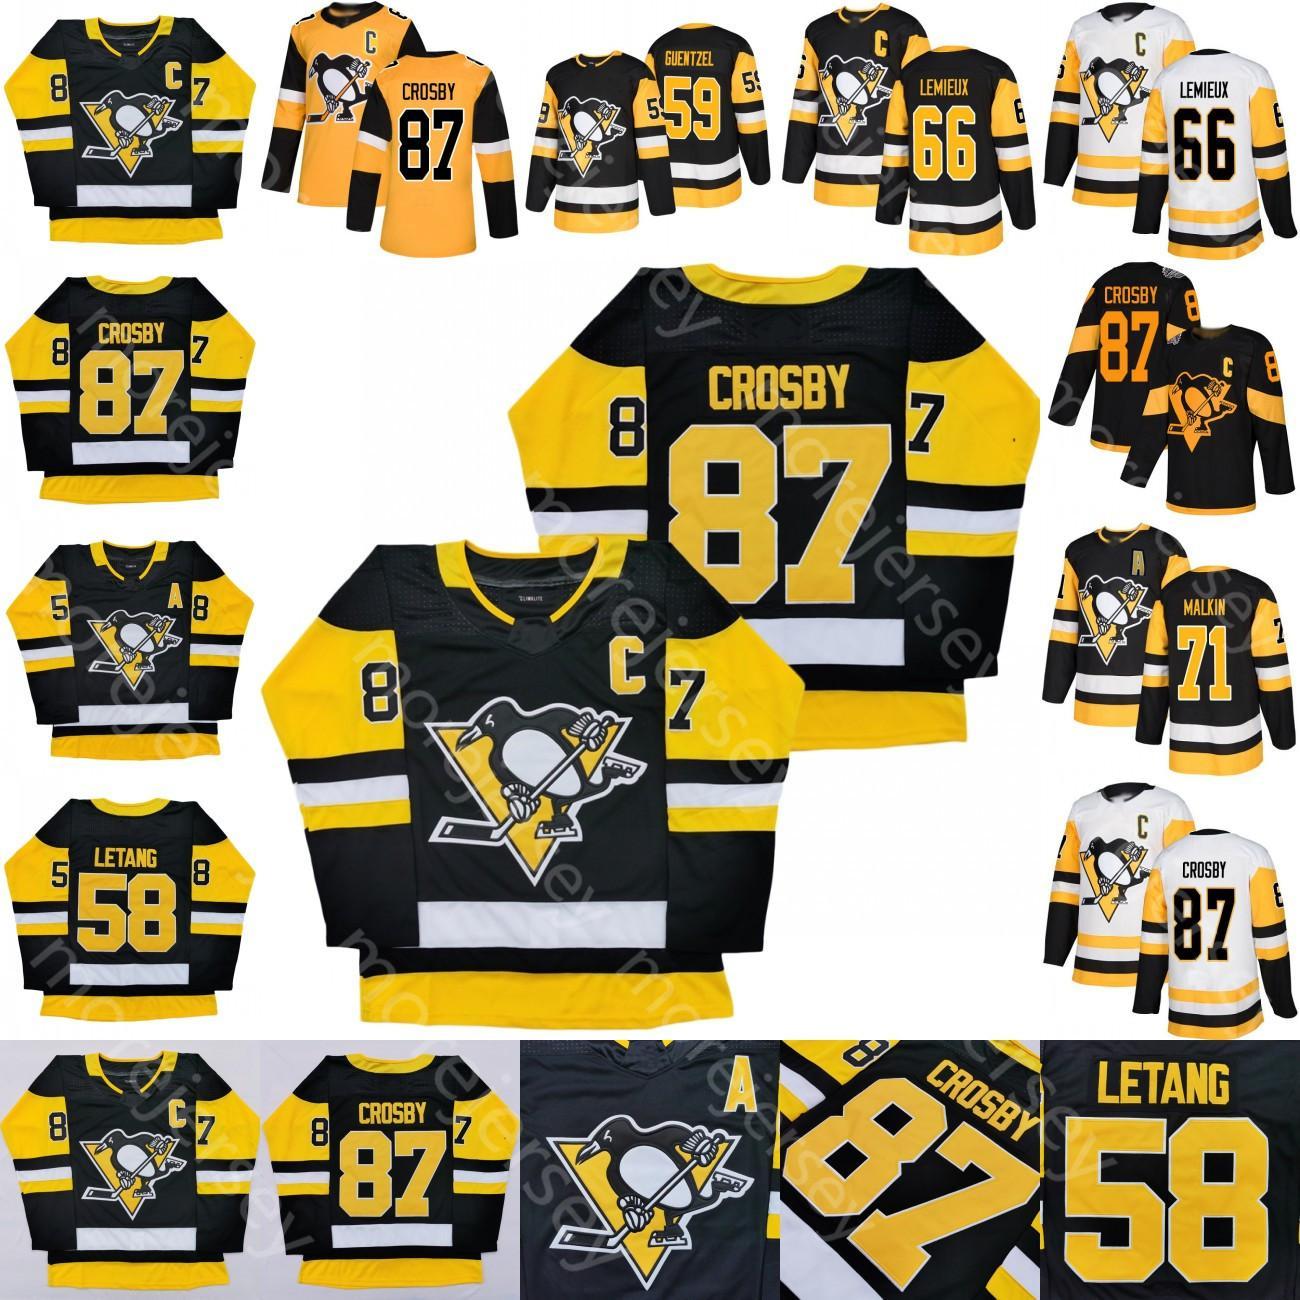 Penguins de Pittsburgh personnalisés Jersey Sidney Crosby Patric Hornqvist Evgeni Malkin Mario Lemieux Matt Murray Kristang Guentzel